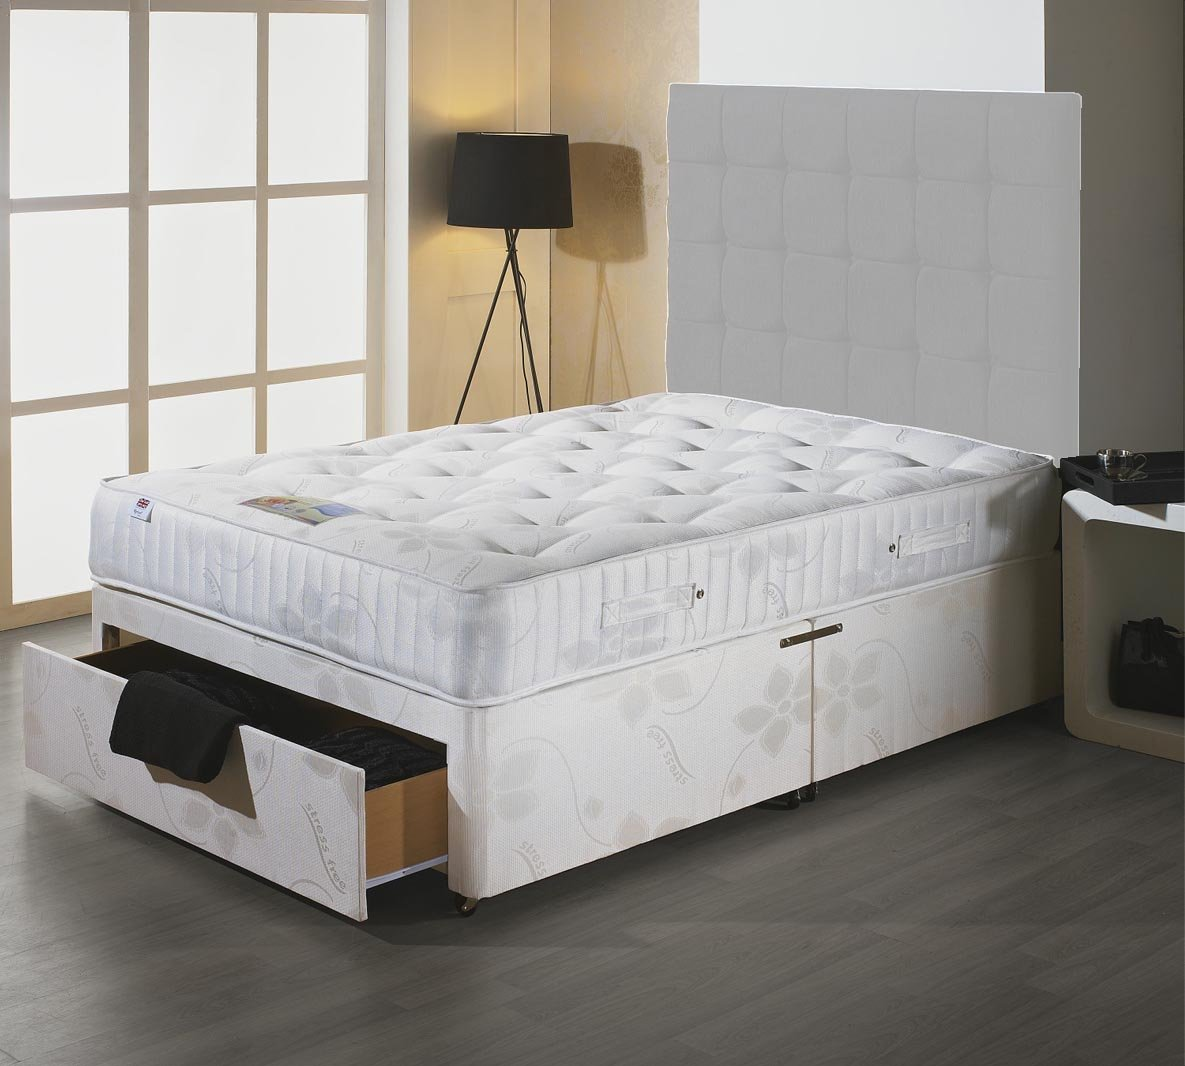 luxan Stress Free King Size Bett-Set – ohne: Amazon.de: Elektronik